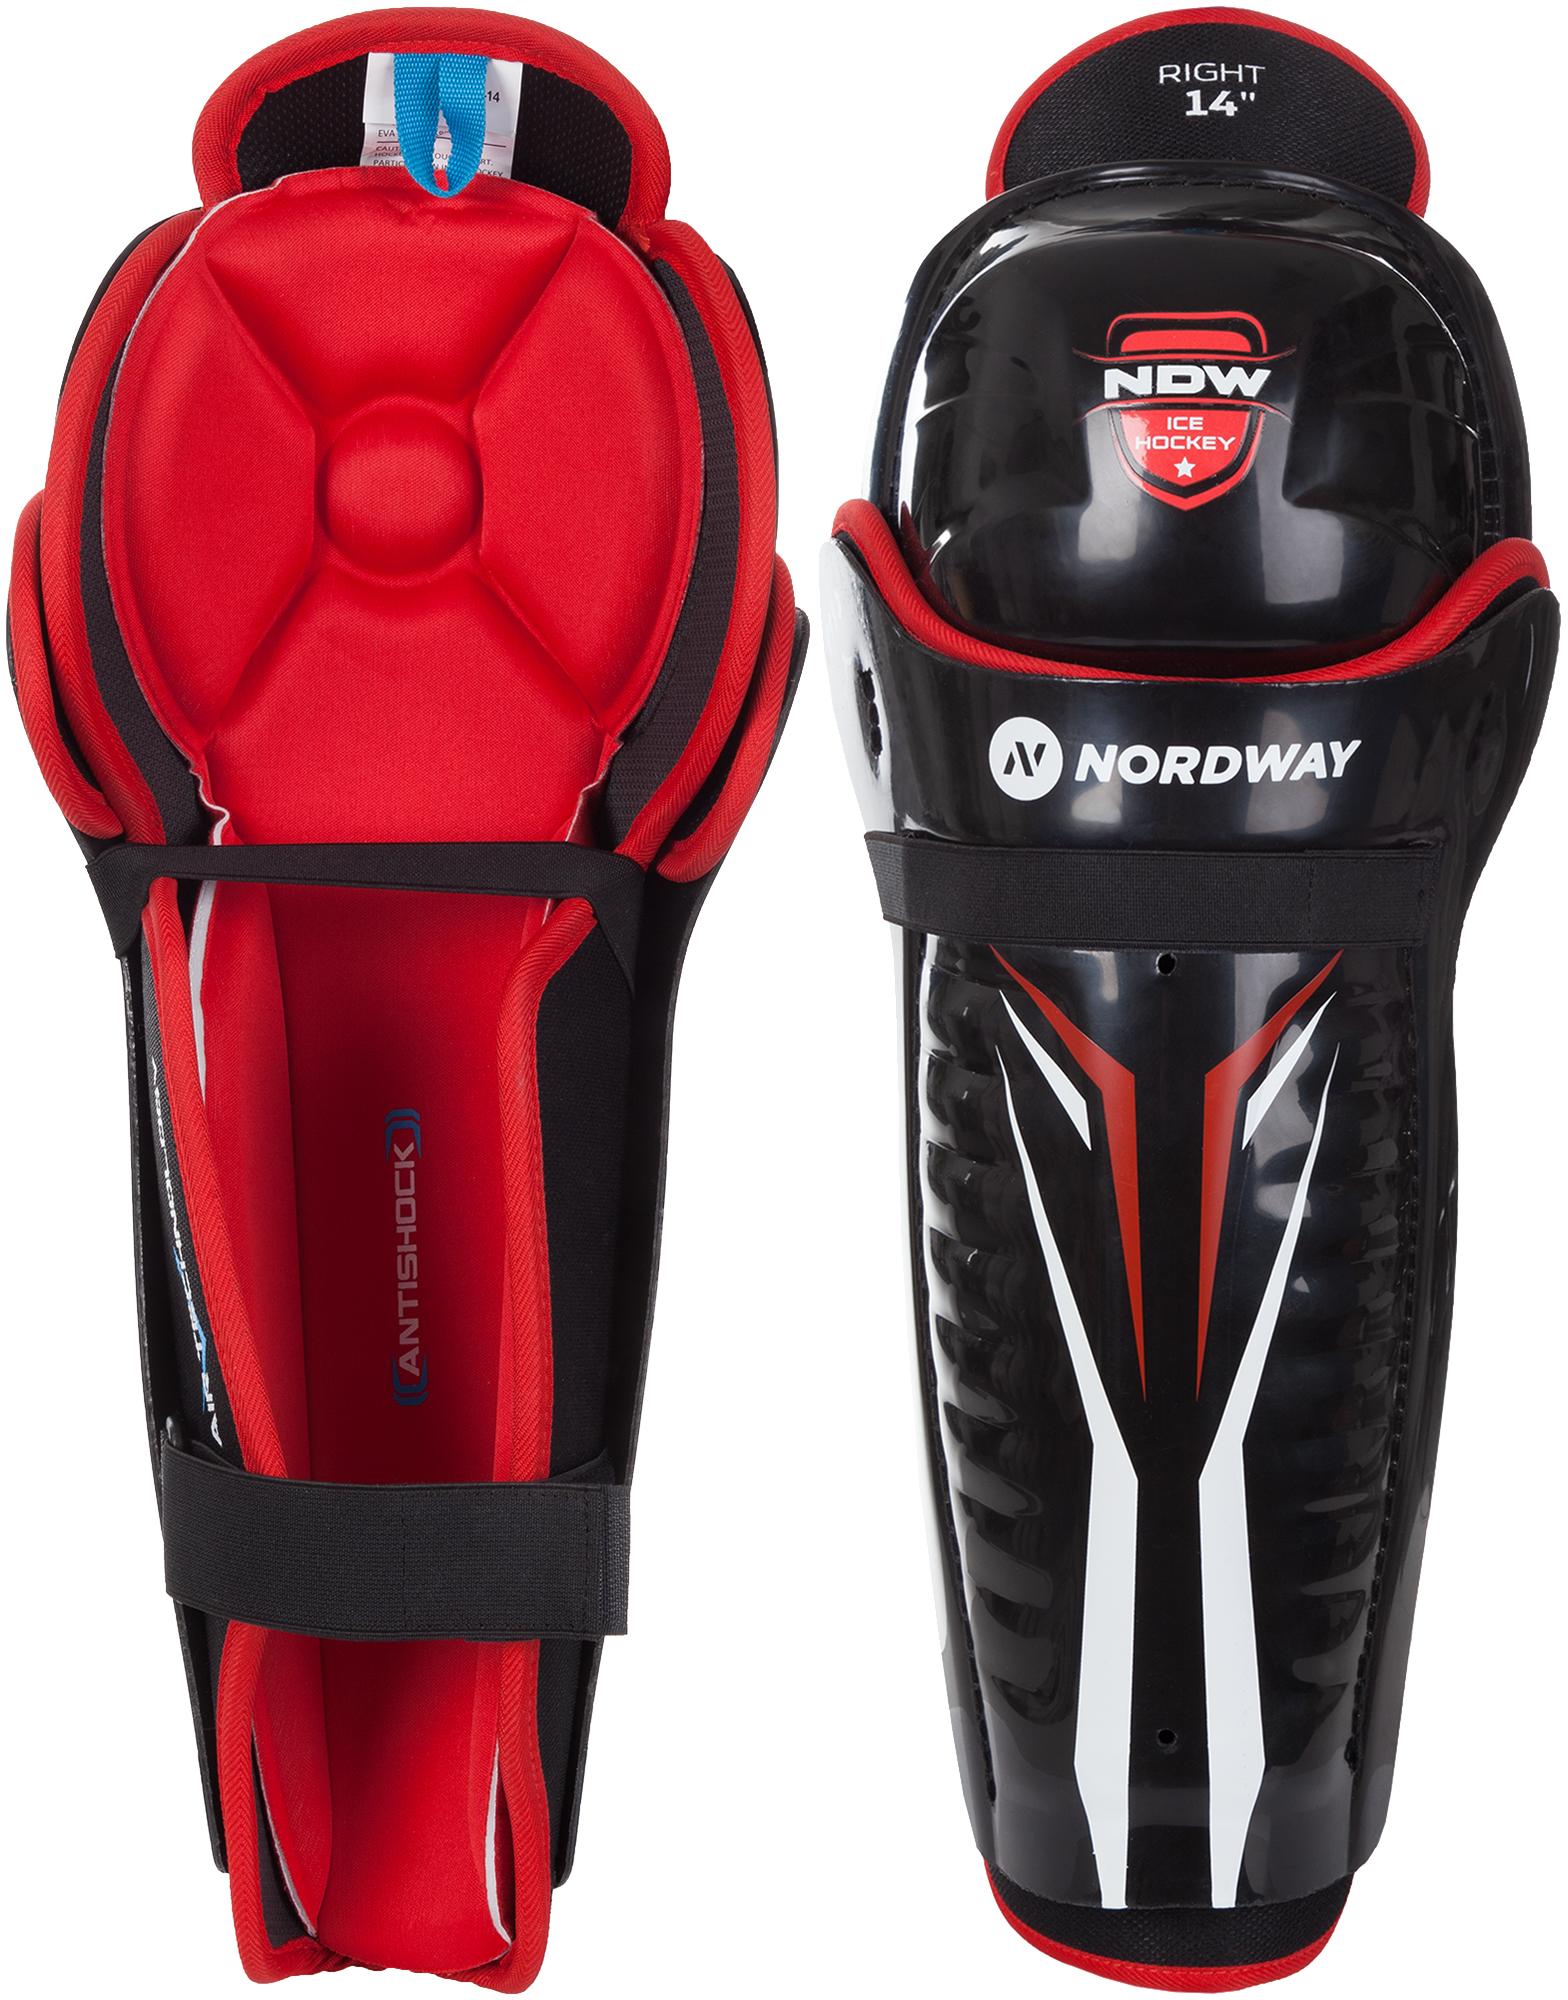 Nordway Щитки хоккейные Nordway SHIN GUARDS, размер 14 цены онлайн